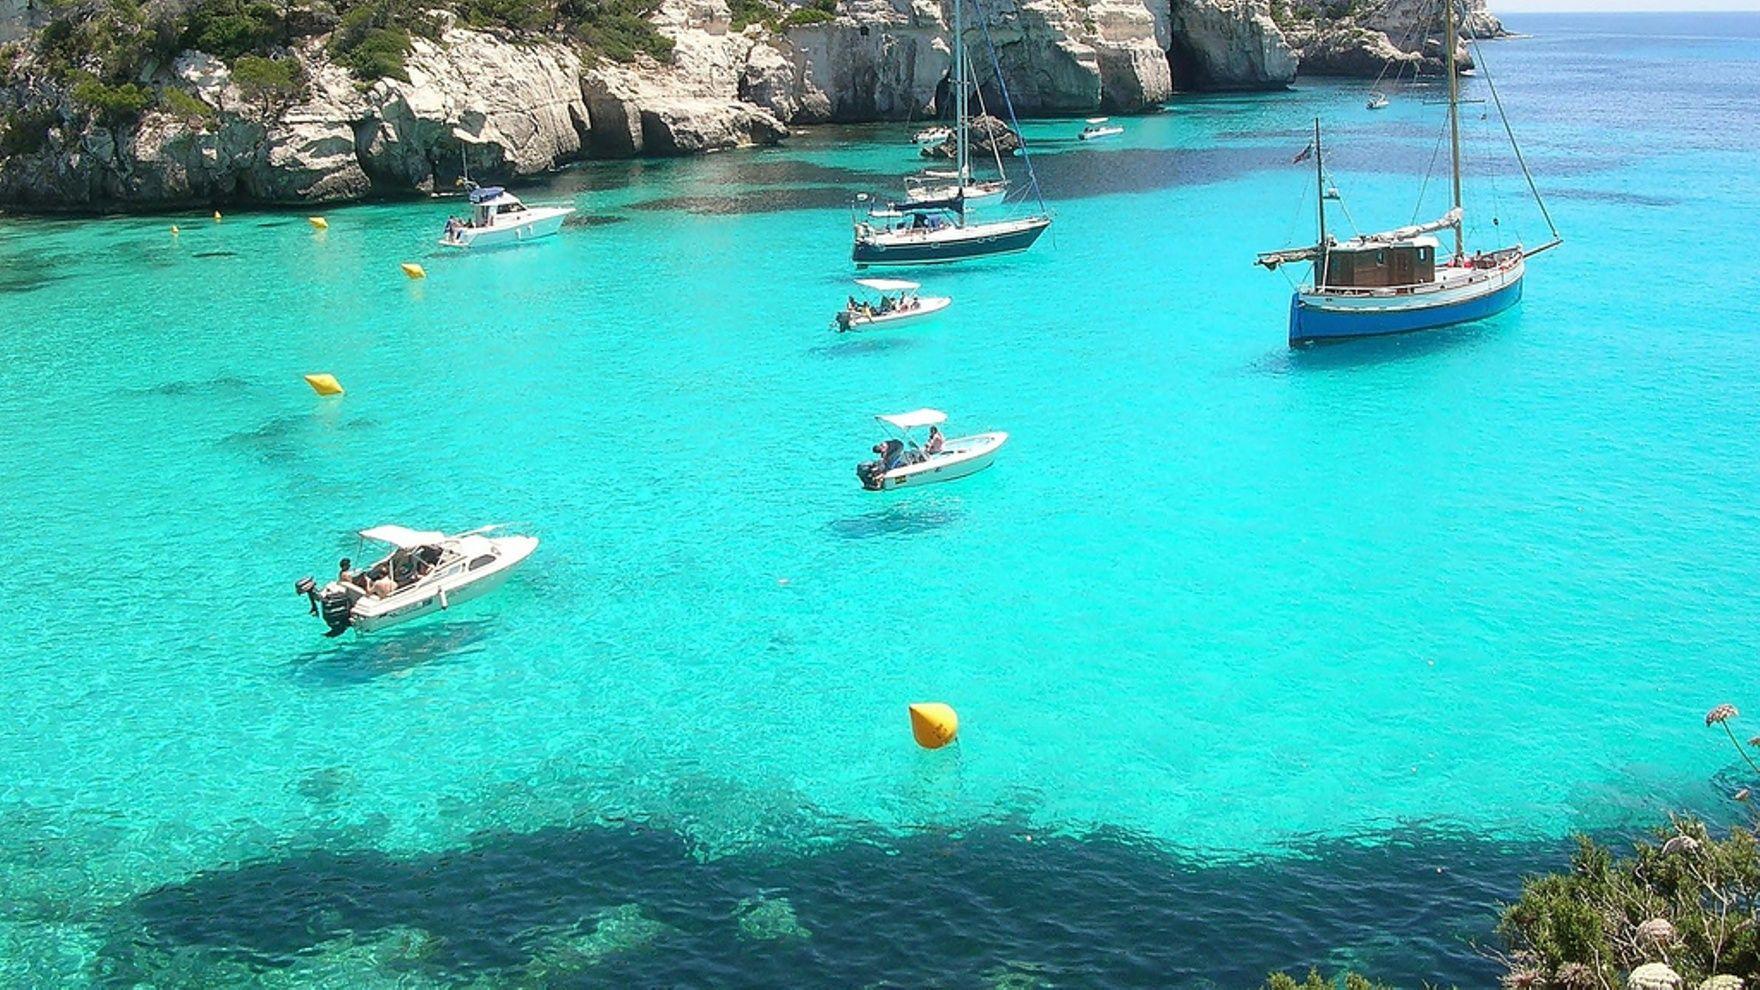 Balearic Islands cruise